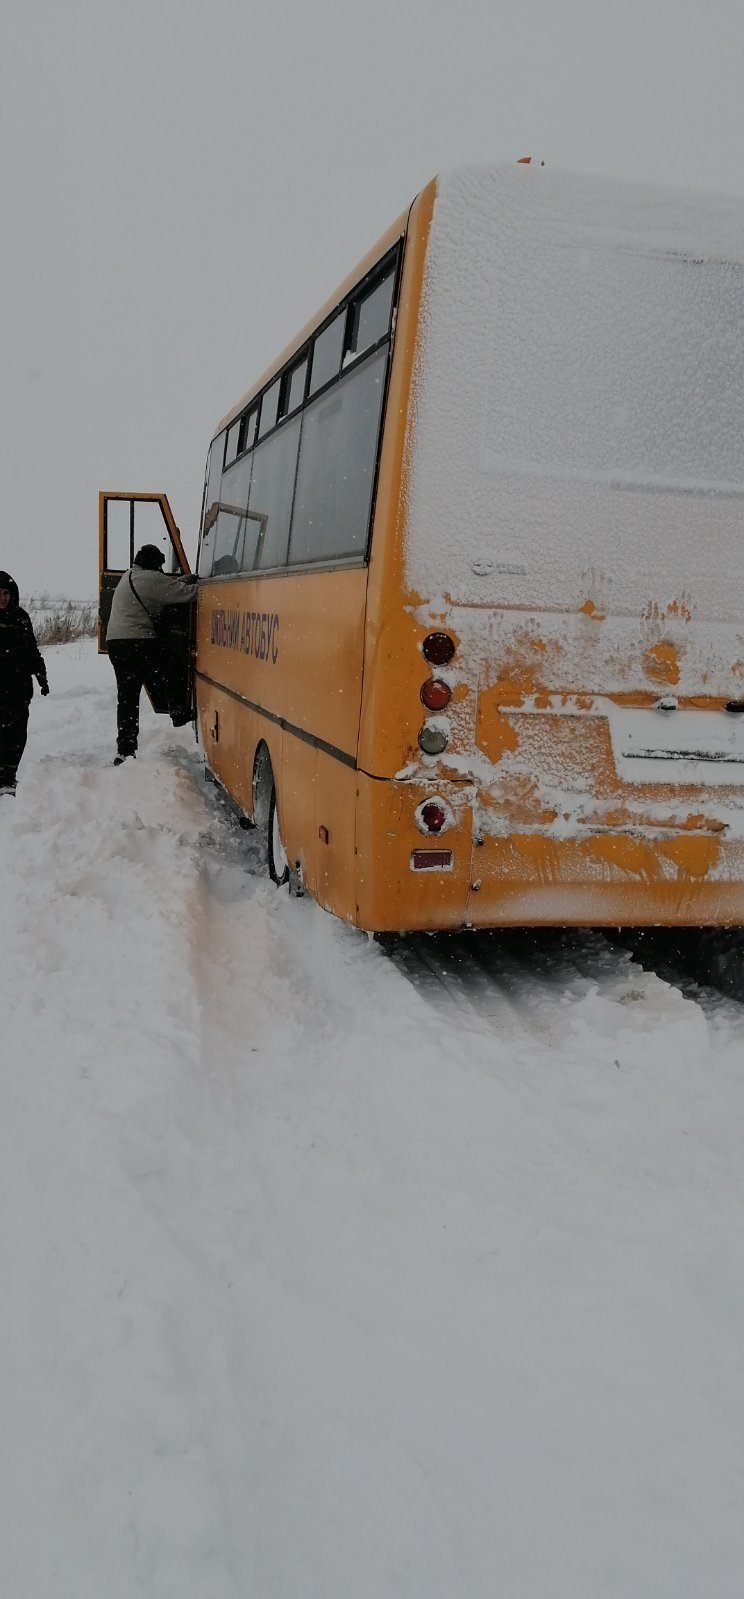 Автобус застряг у снігу в с. Угерсько, Фото: ДСНС Львівщини